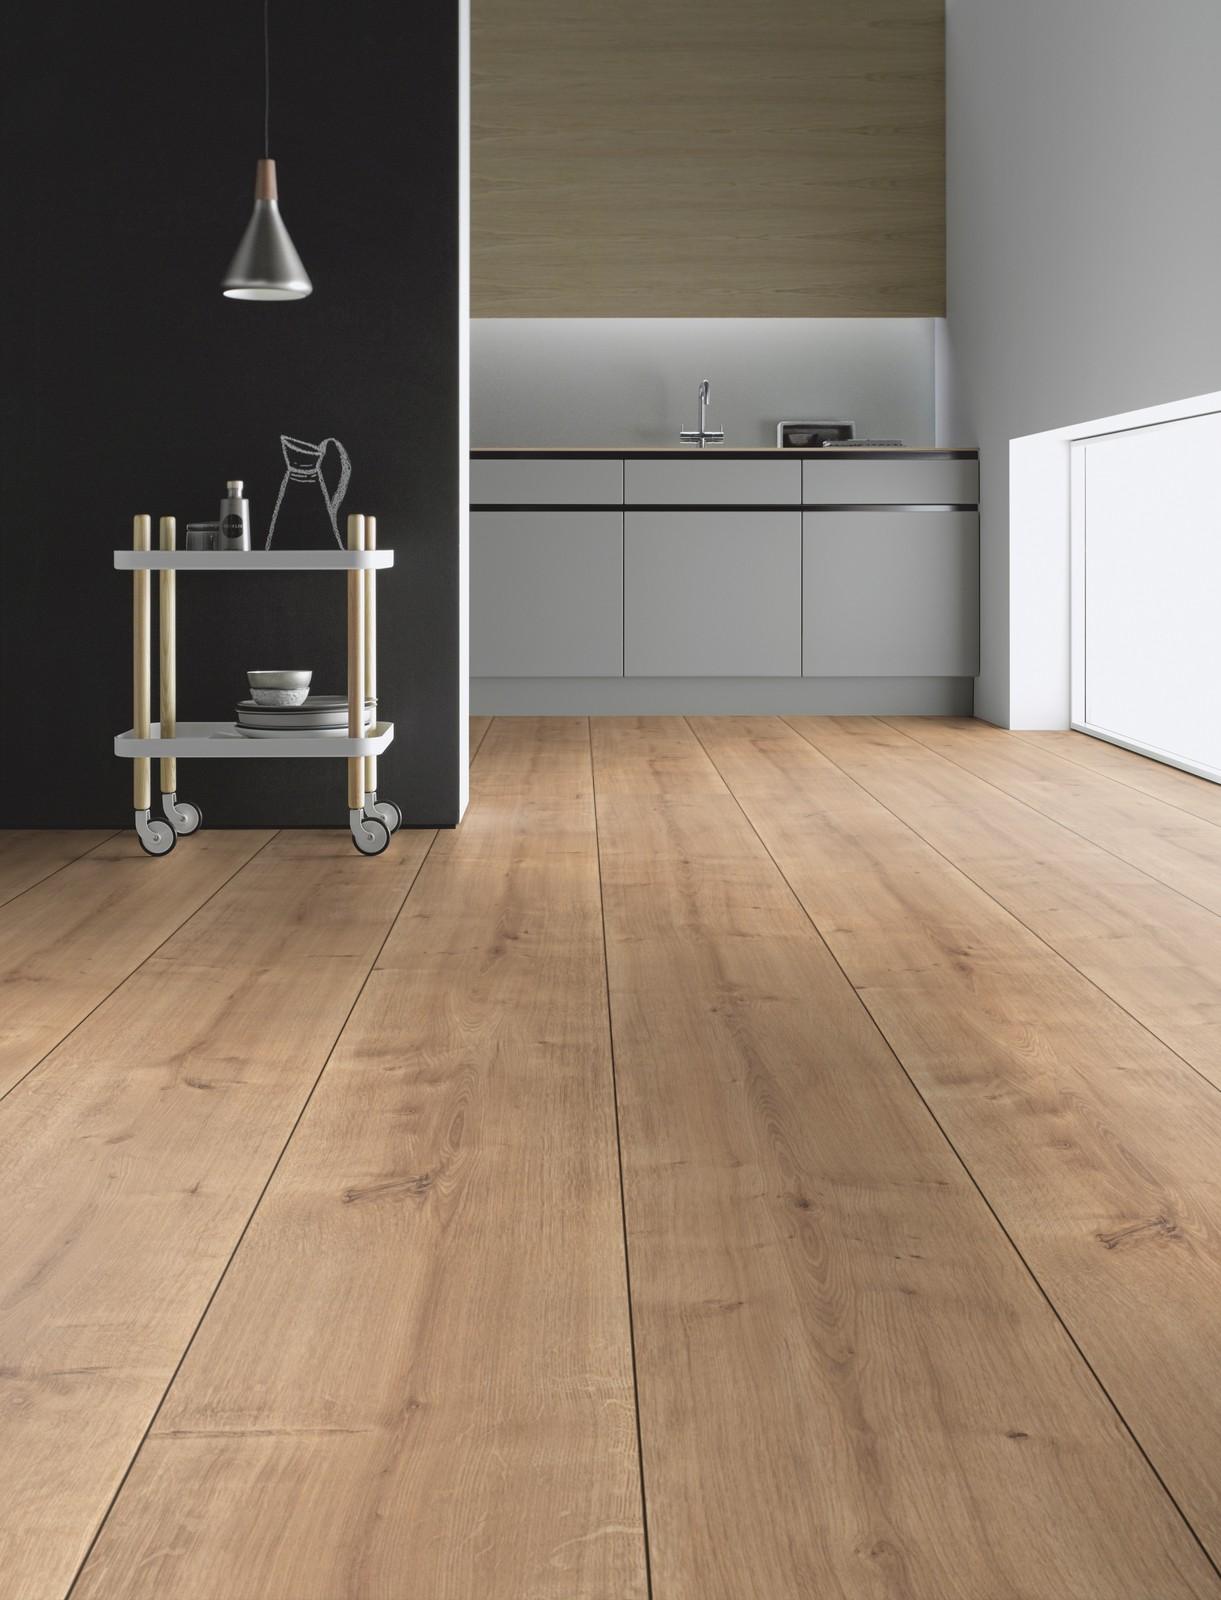 Ter Hürne Oak Berland Pale Brown, Extra Long Laminate Flooring